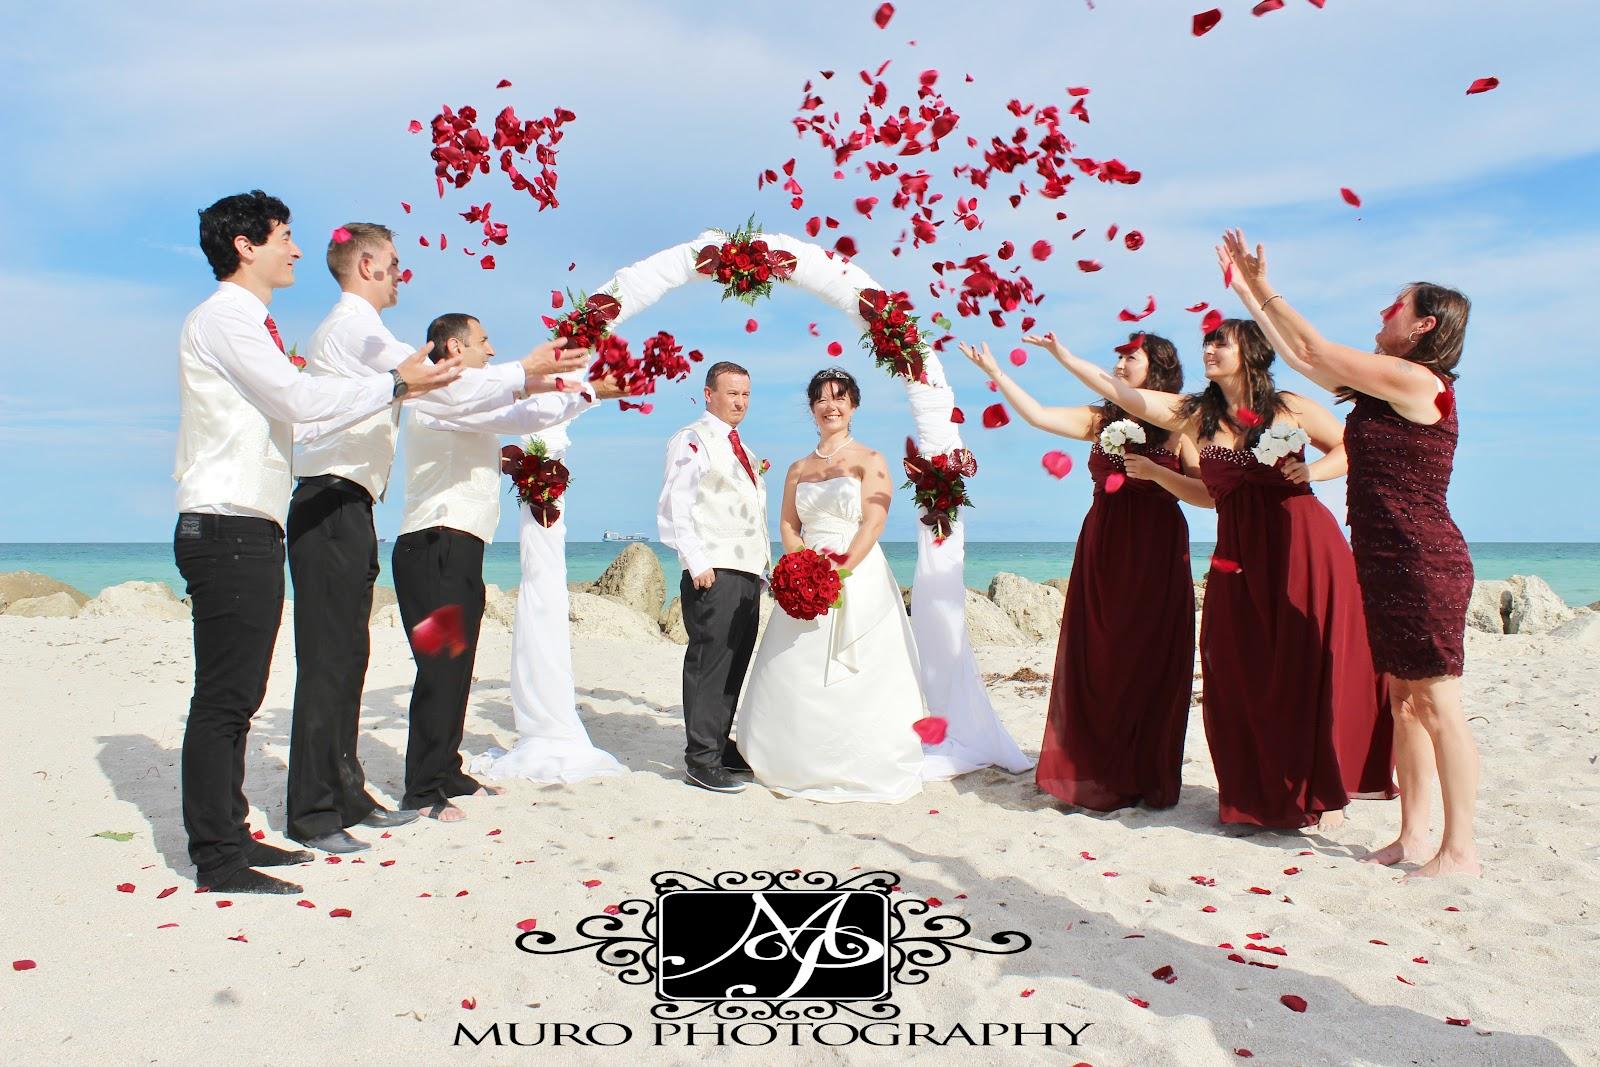 Wedding Graphy Miami | Affordable Beach Weddings 305 793 4387 Danielle Robert Miami